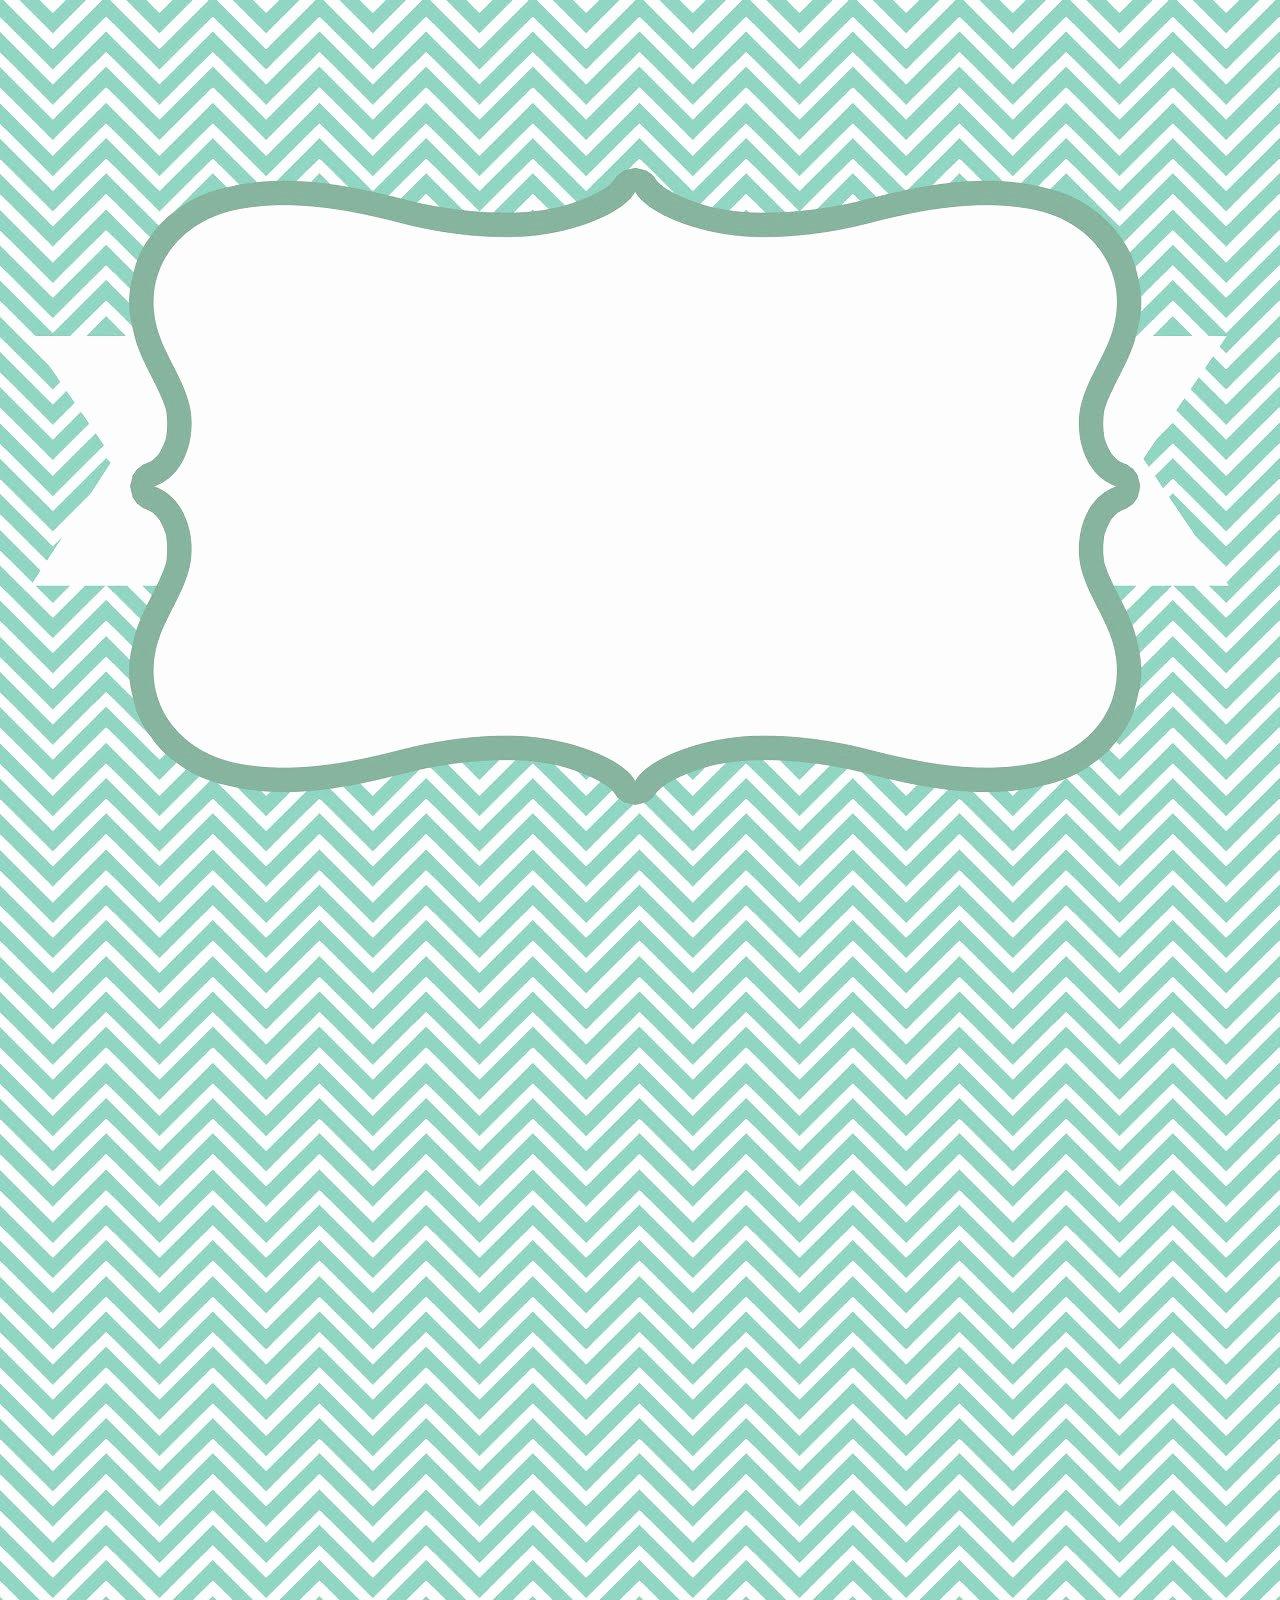 8 Best Of Blank Chevron Binder Cover Printables